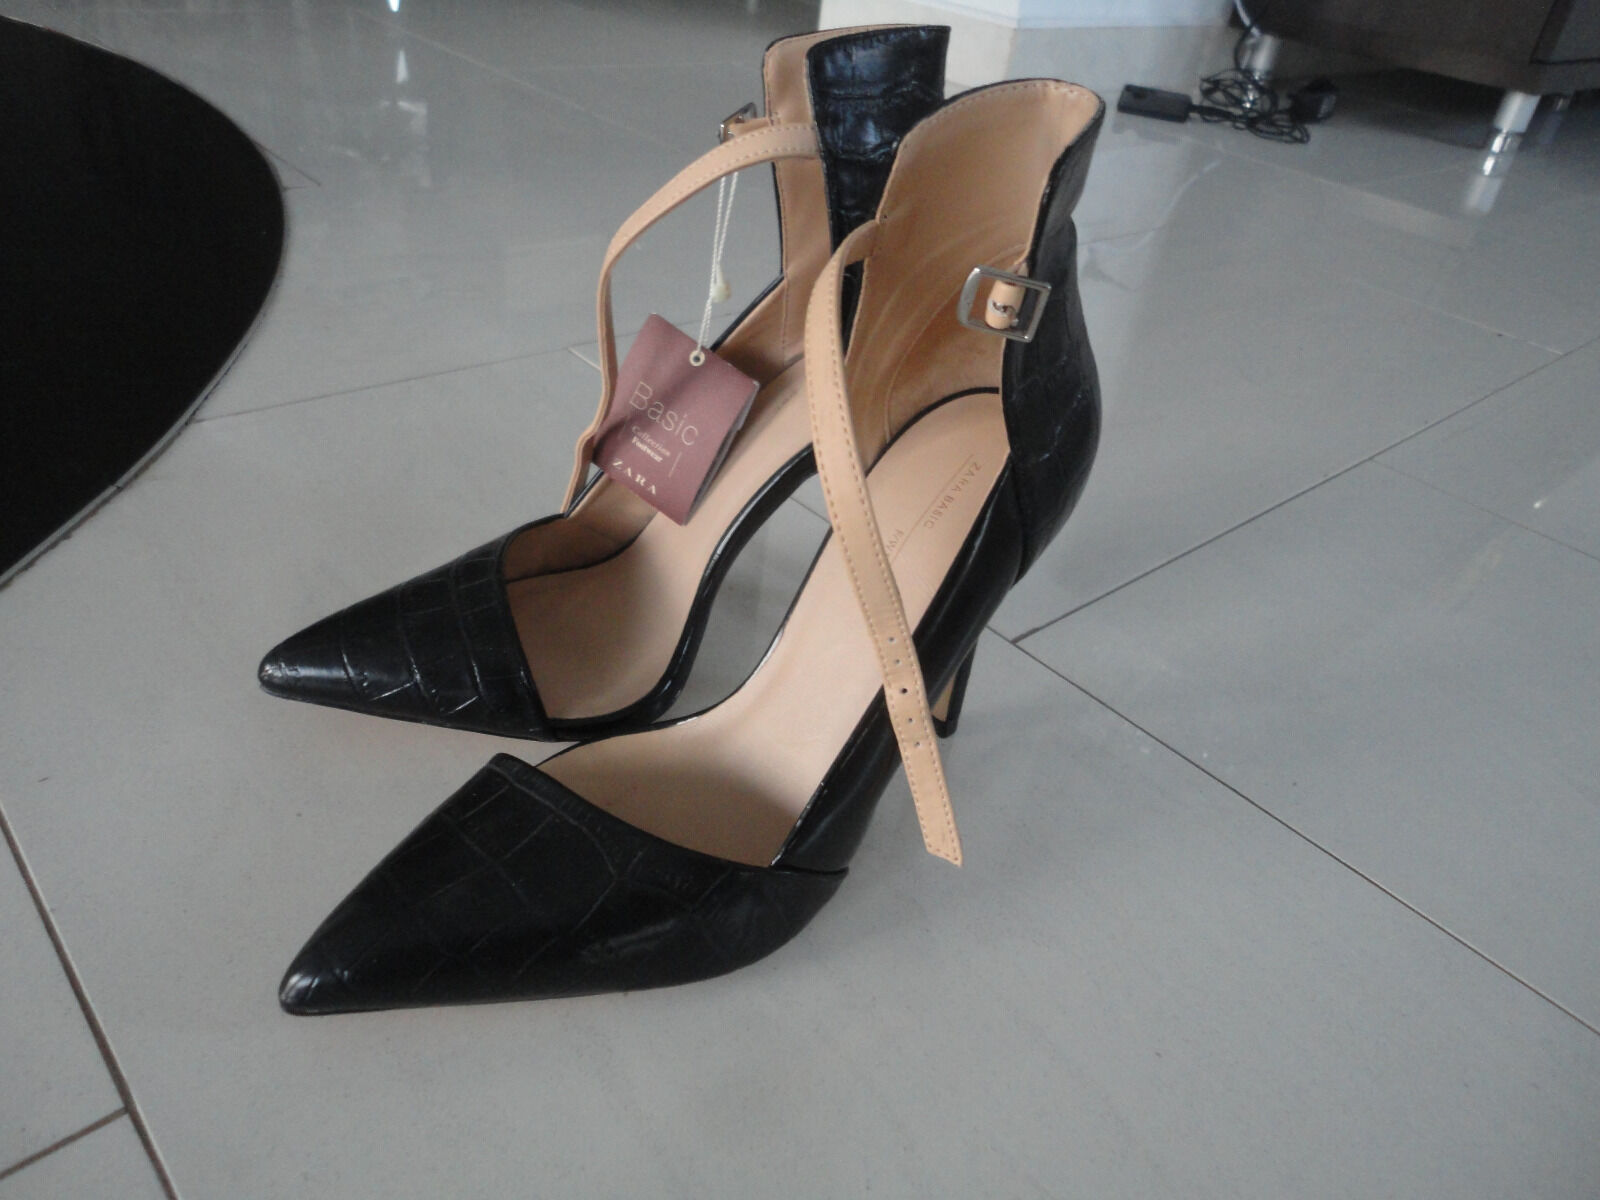 Zara Leder schwarz  High Heels Pumps Gr. 38